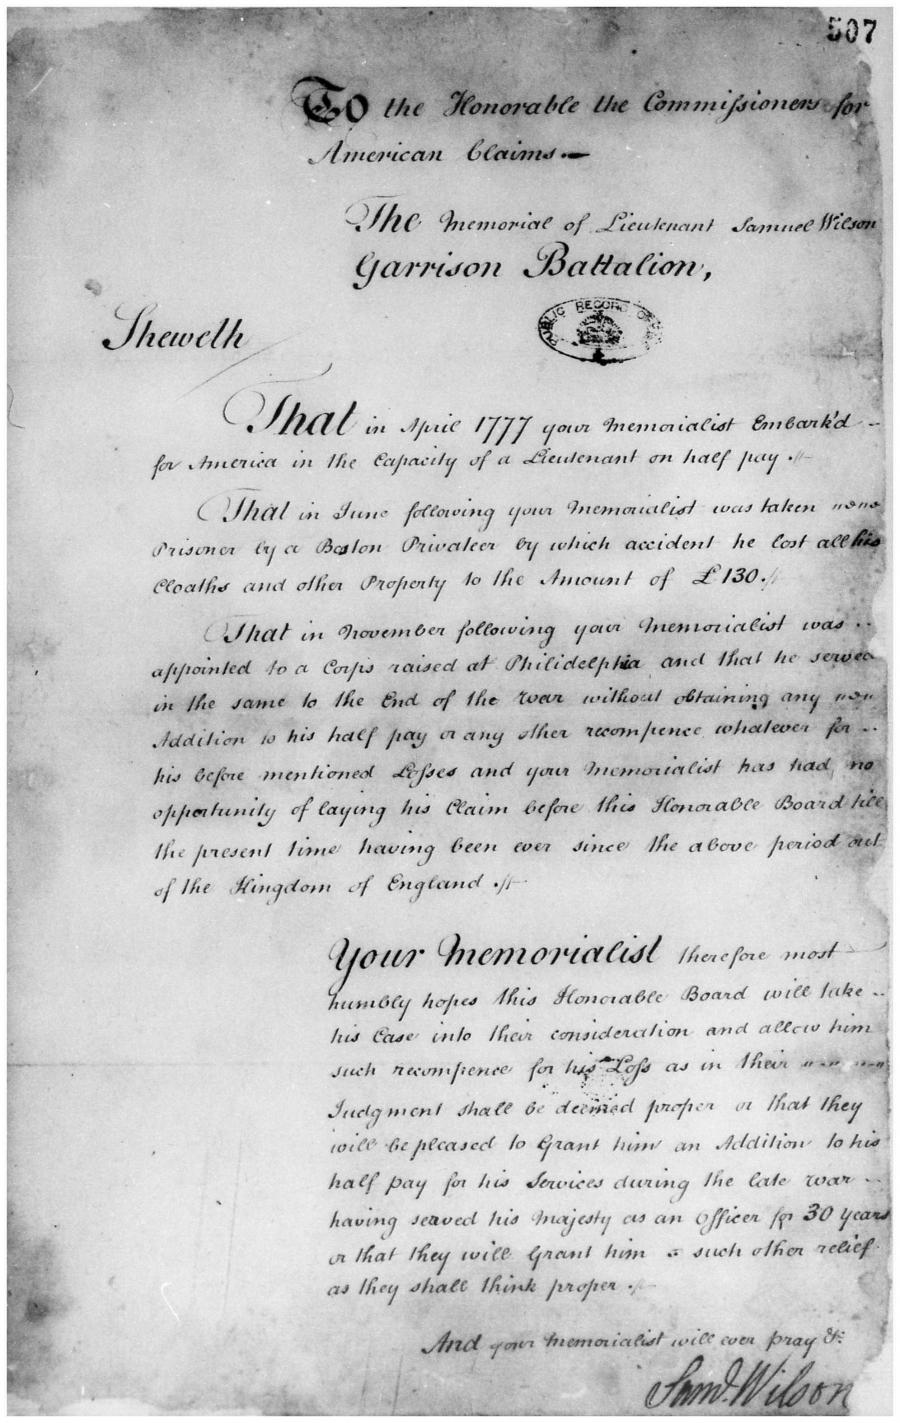 Wilson loyalist claim